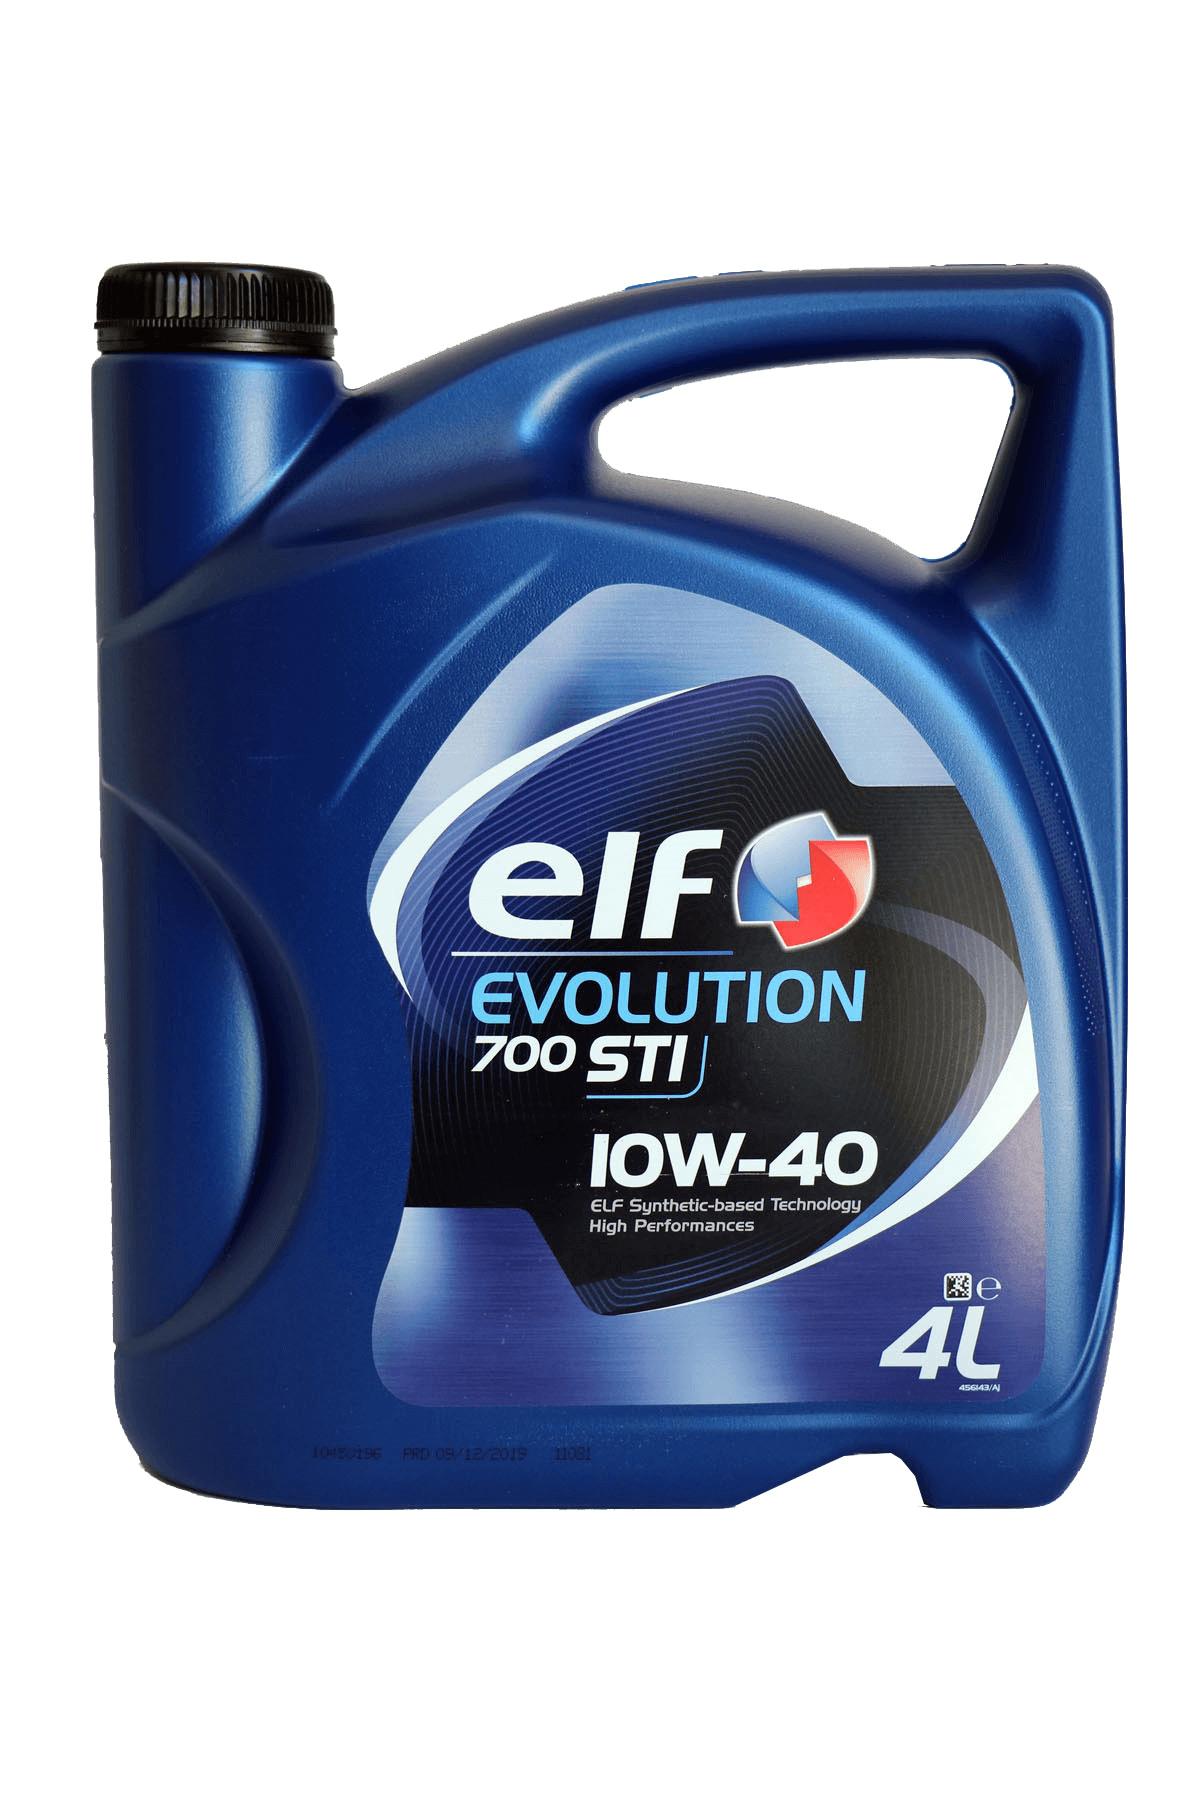 ELF Evolution 700 STI 10W-40 Motoröl, 4l